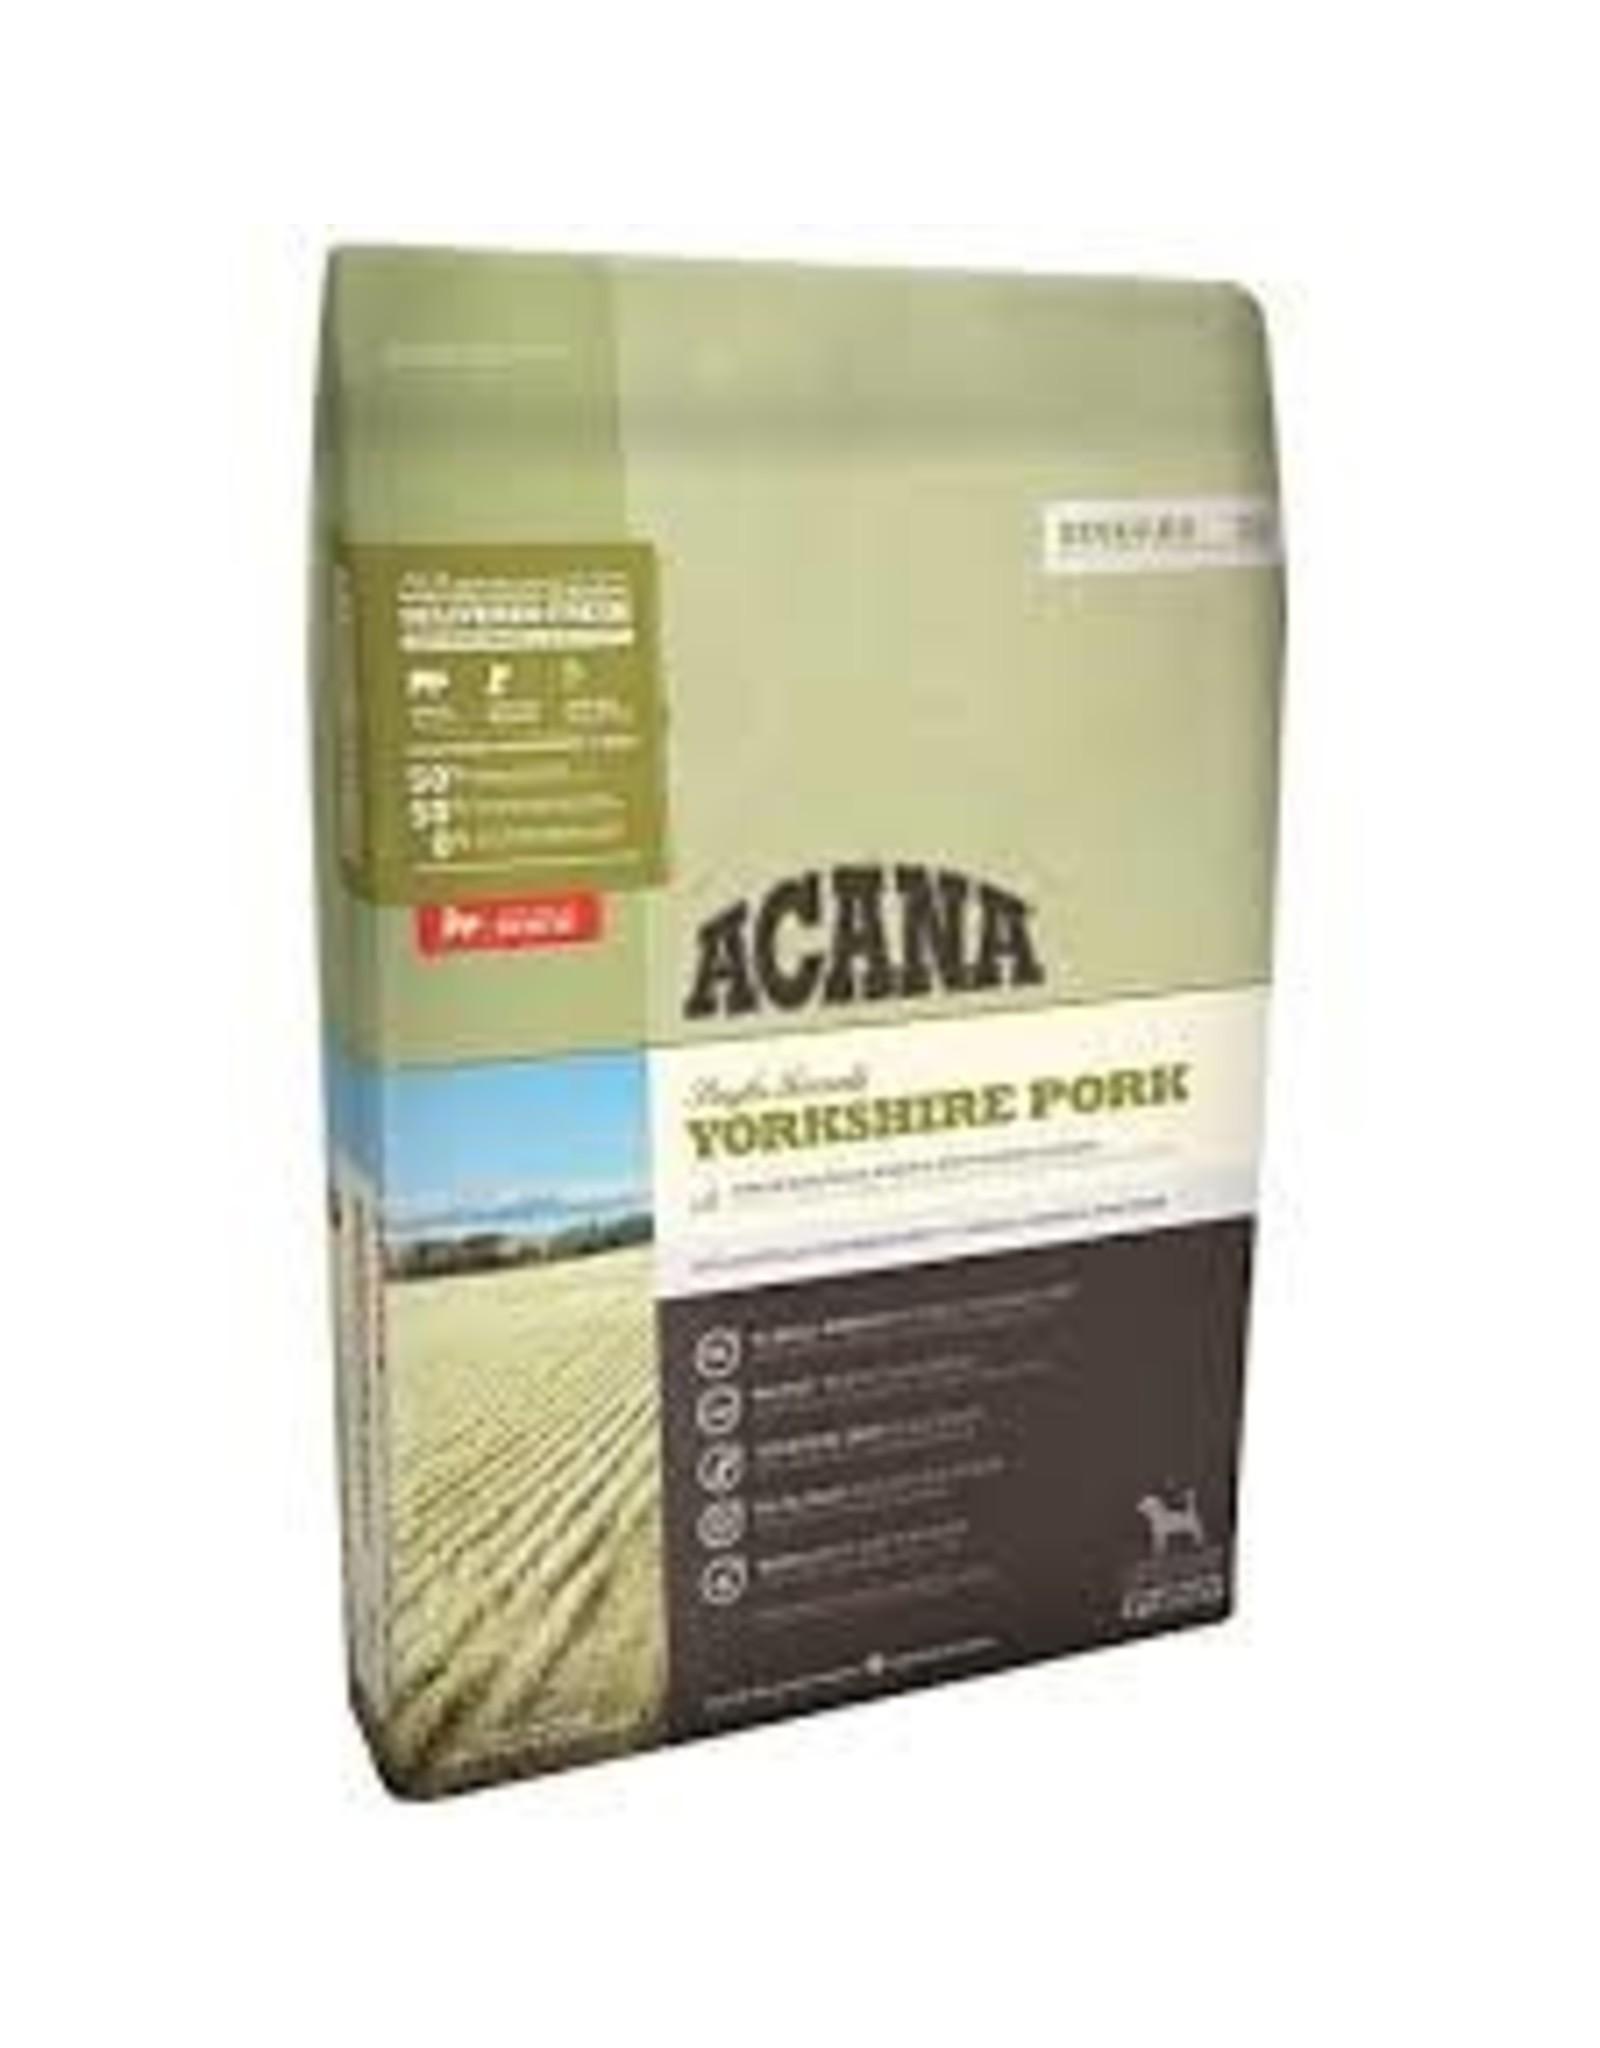 Acana Acana - Yorkshire Pork & Squash Dog